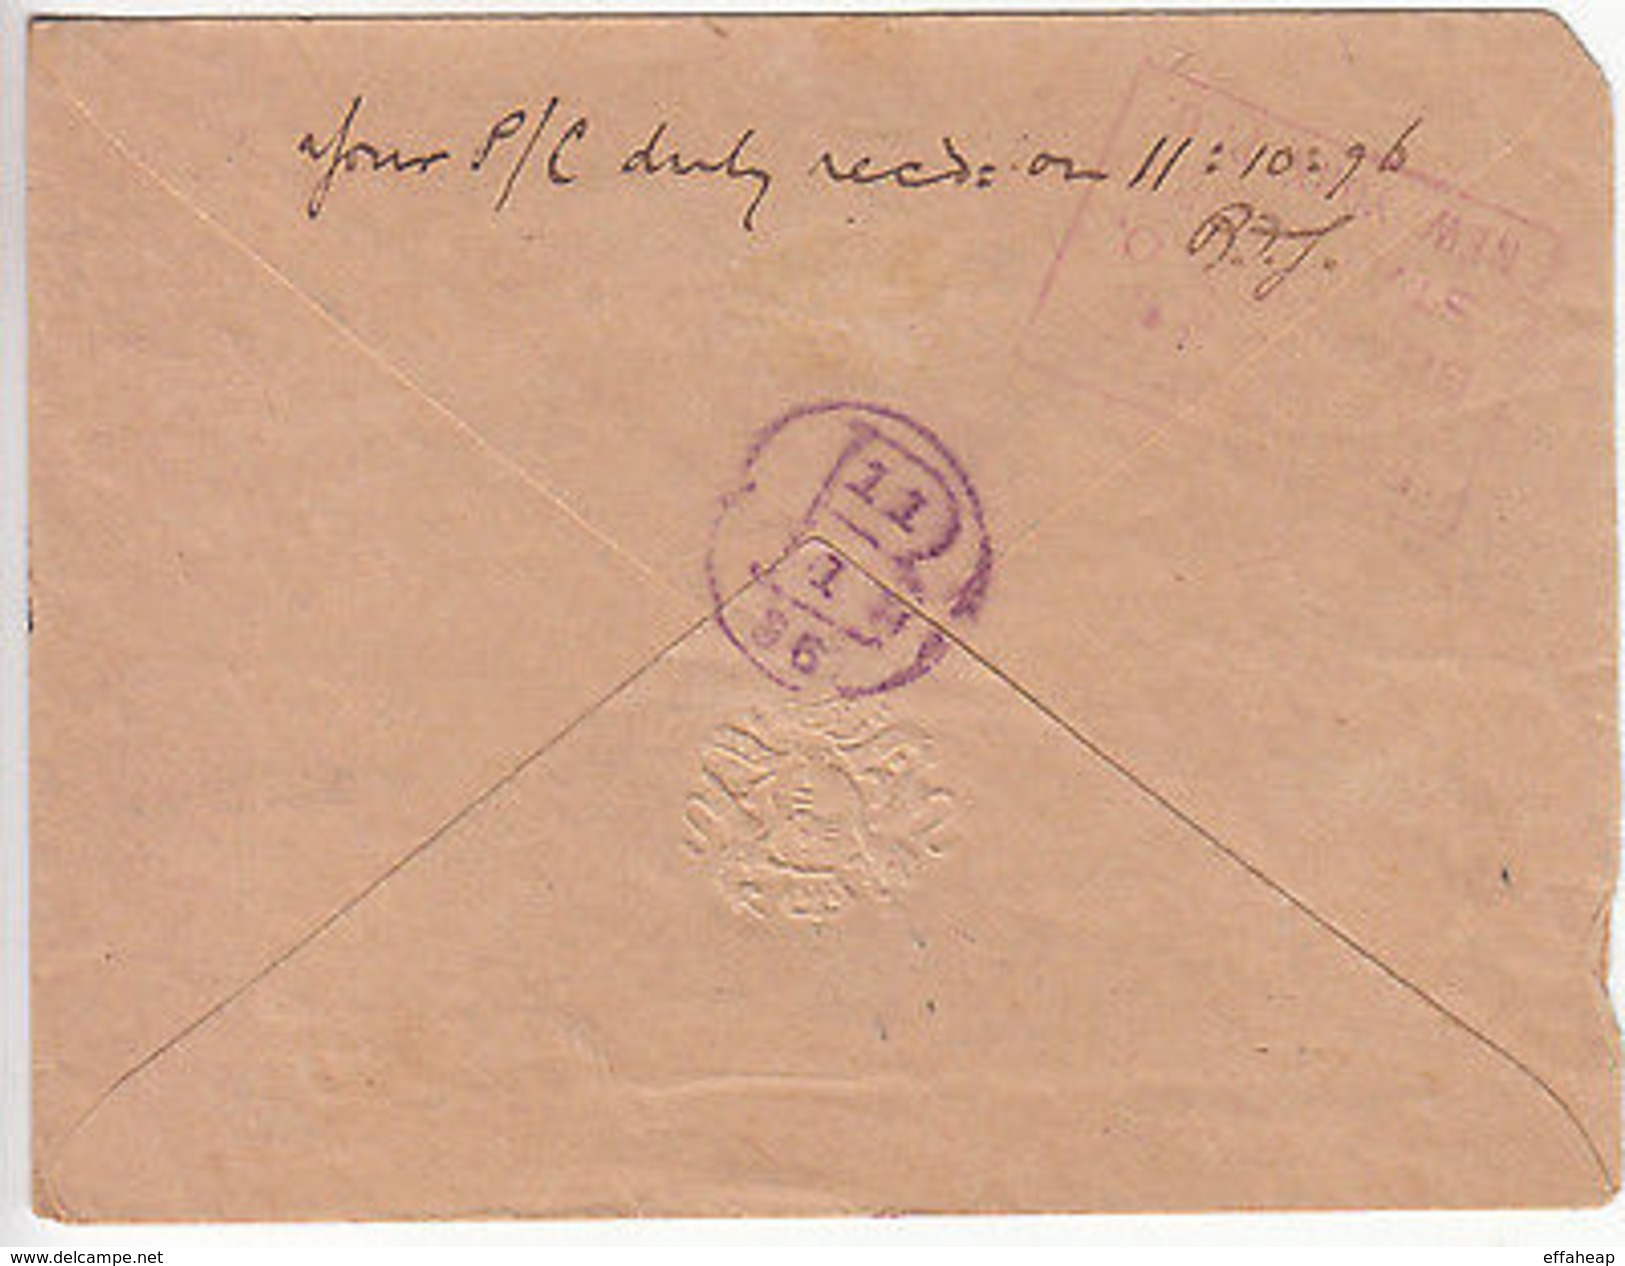 Dominica: Cover Treasurer's Office, Dominica, To New York, 12-13 Oct-1 Nov 1896 - Dominica (1978-...)